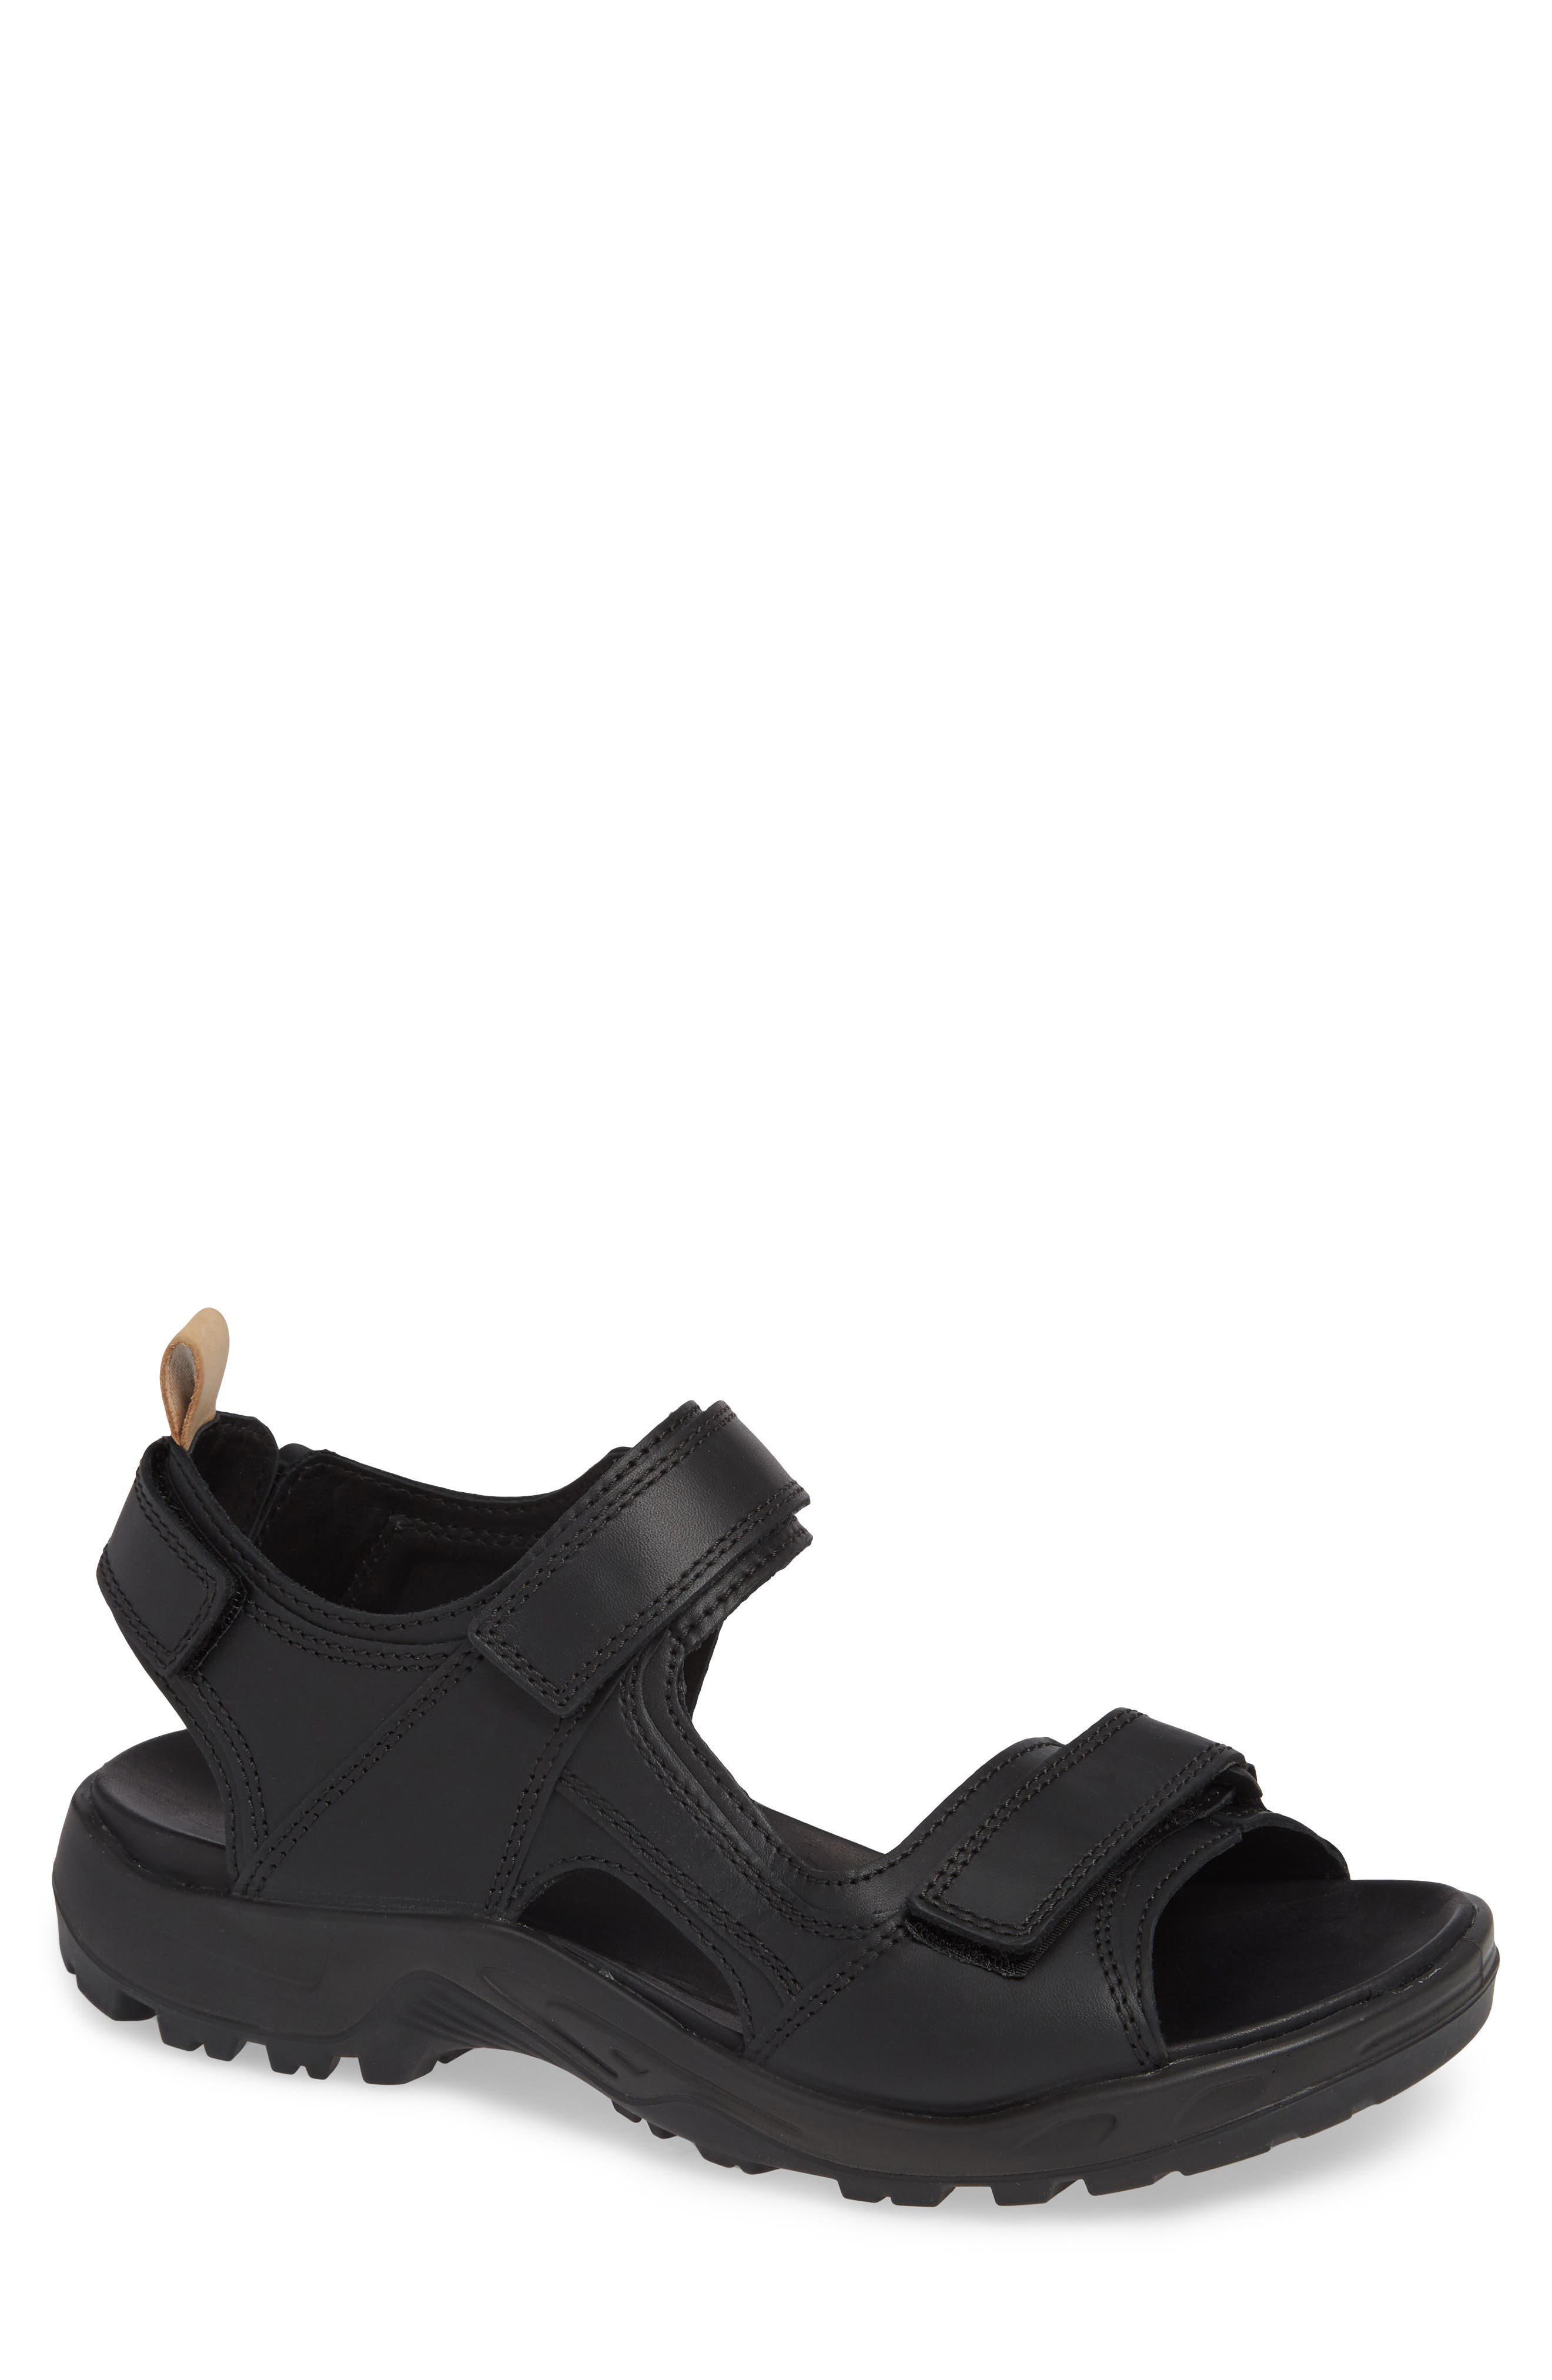 Ecco Premium Offroad Sandal - Black